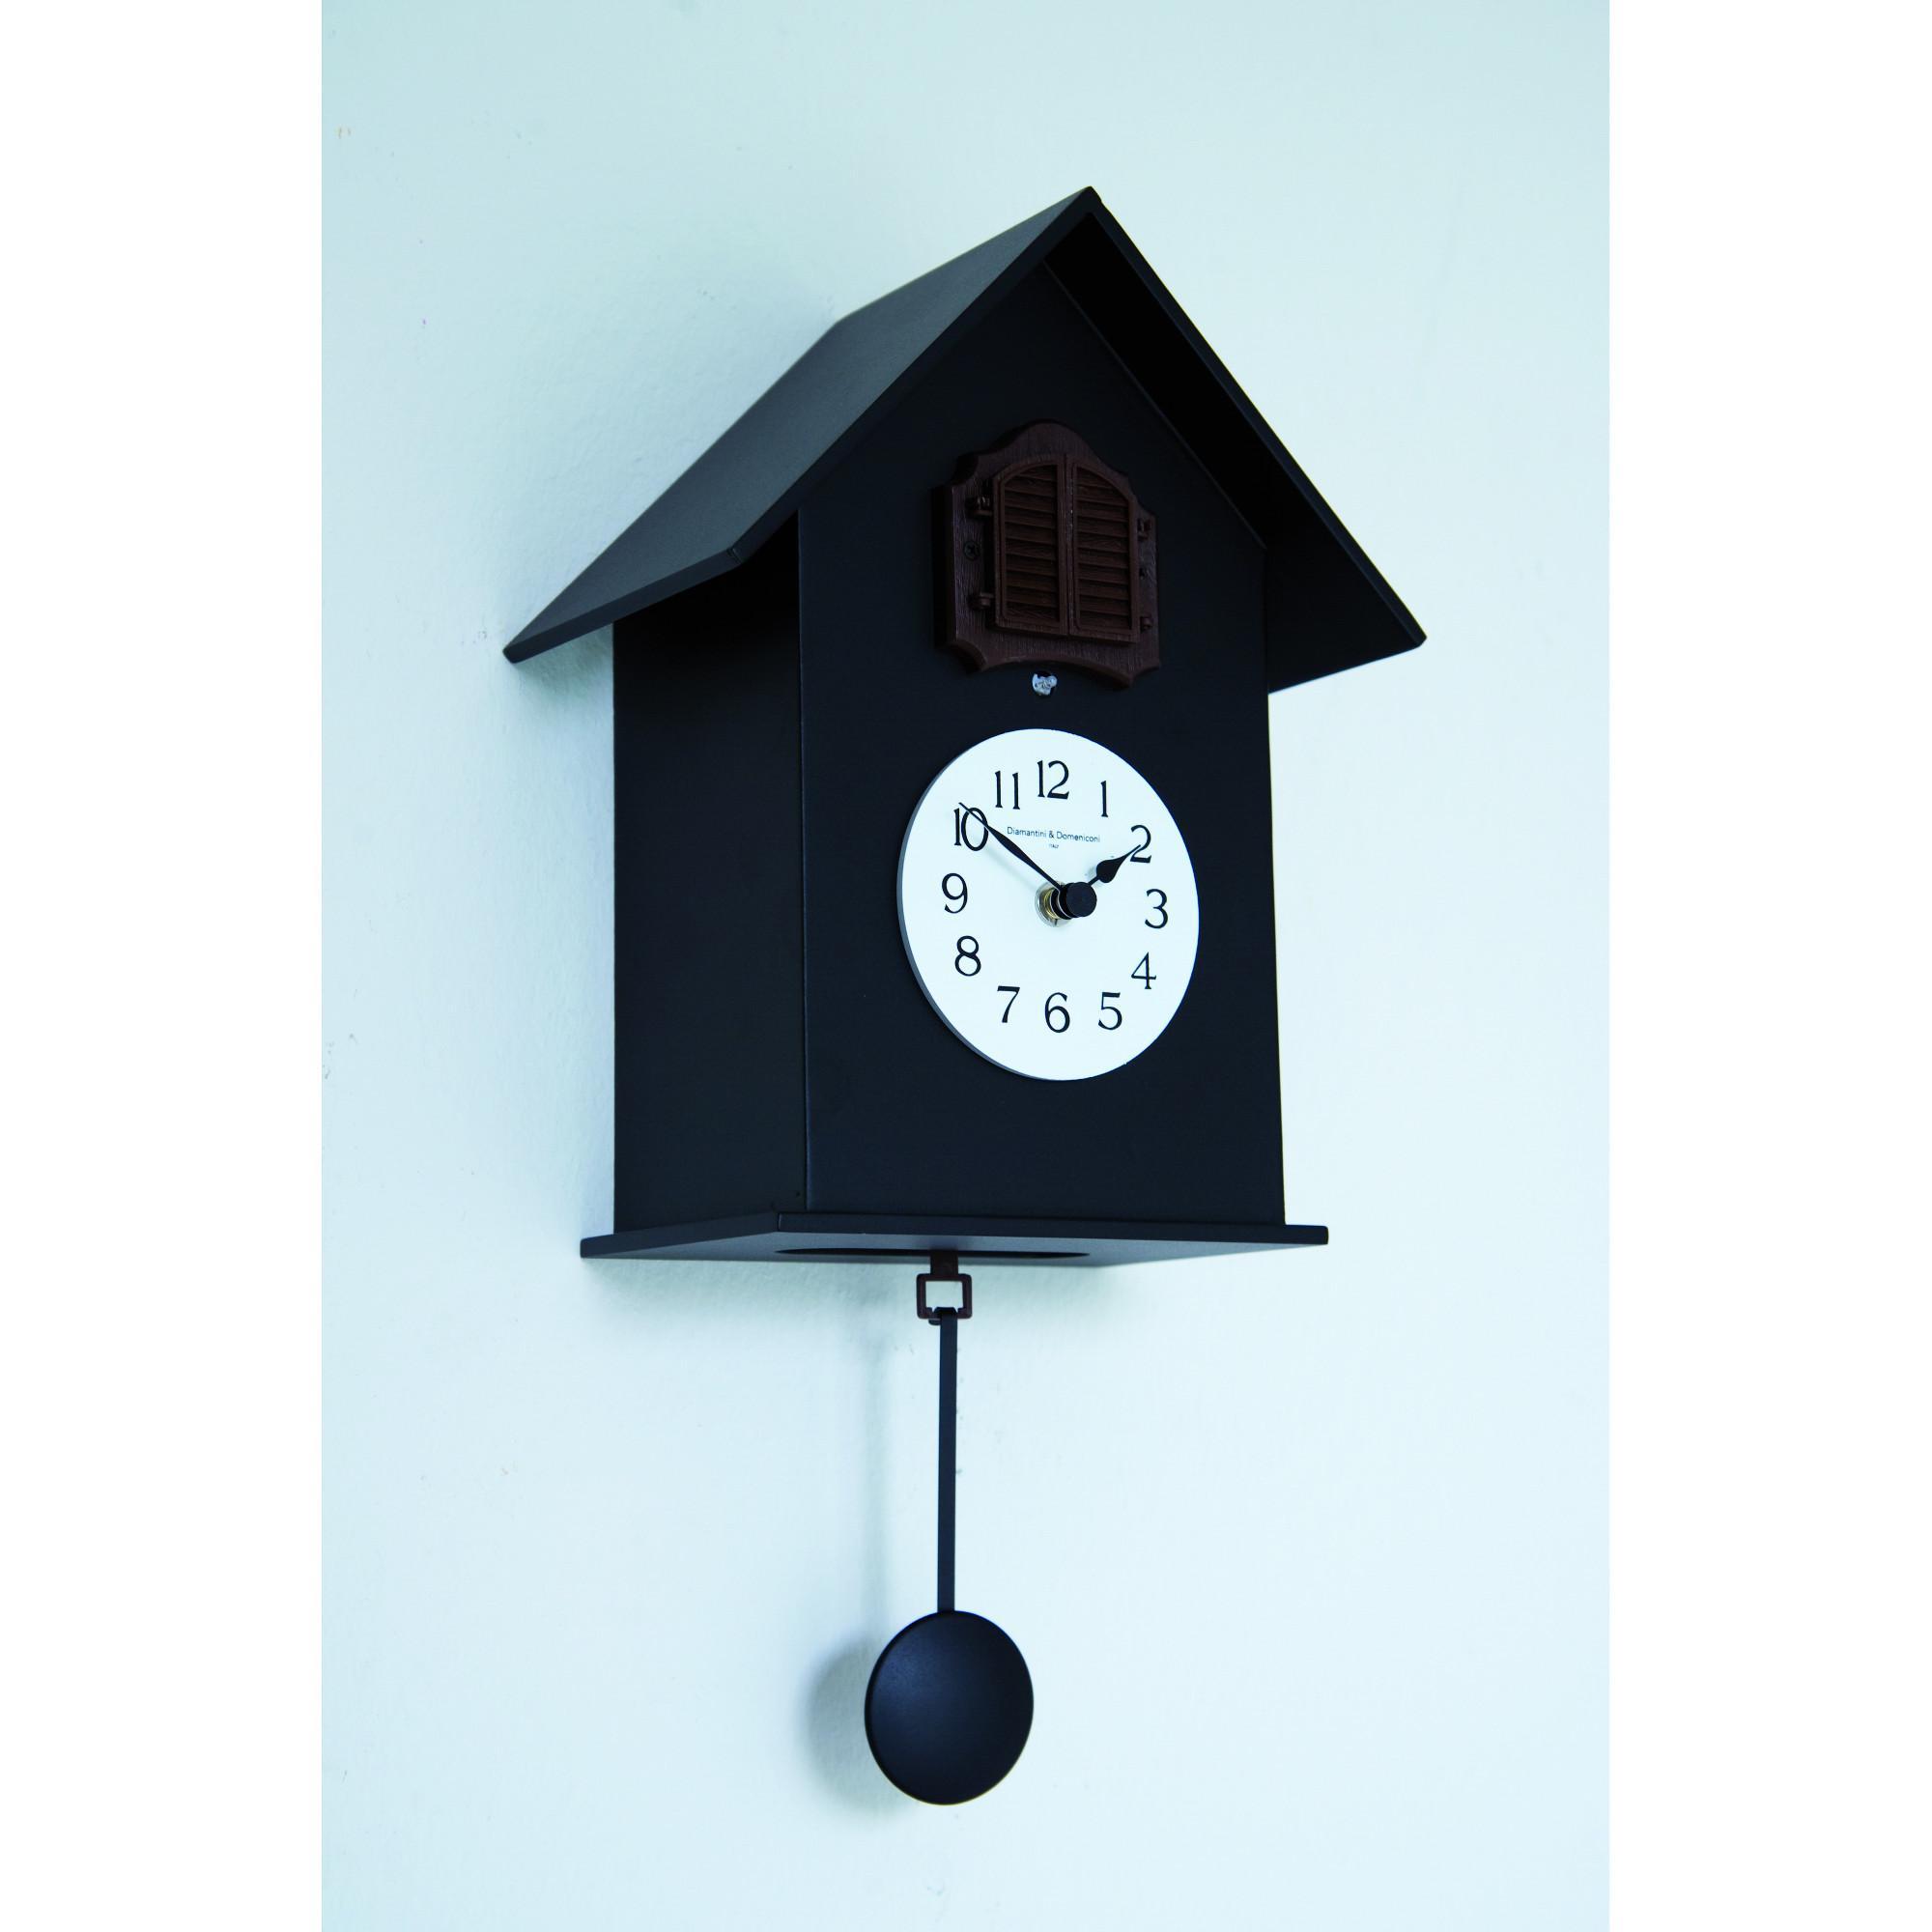 Orologio cucu da muro in legno con cassa in legno laccato - Orologi a cucu design ...